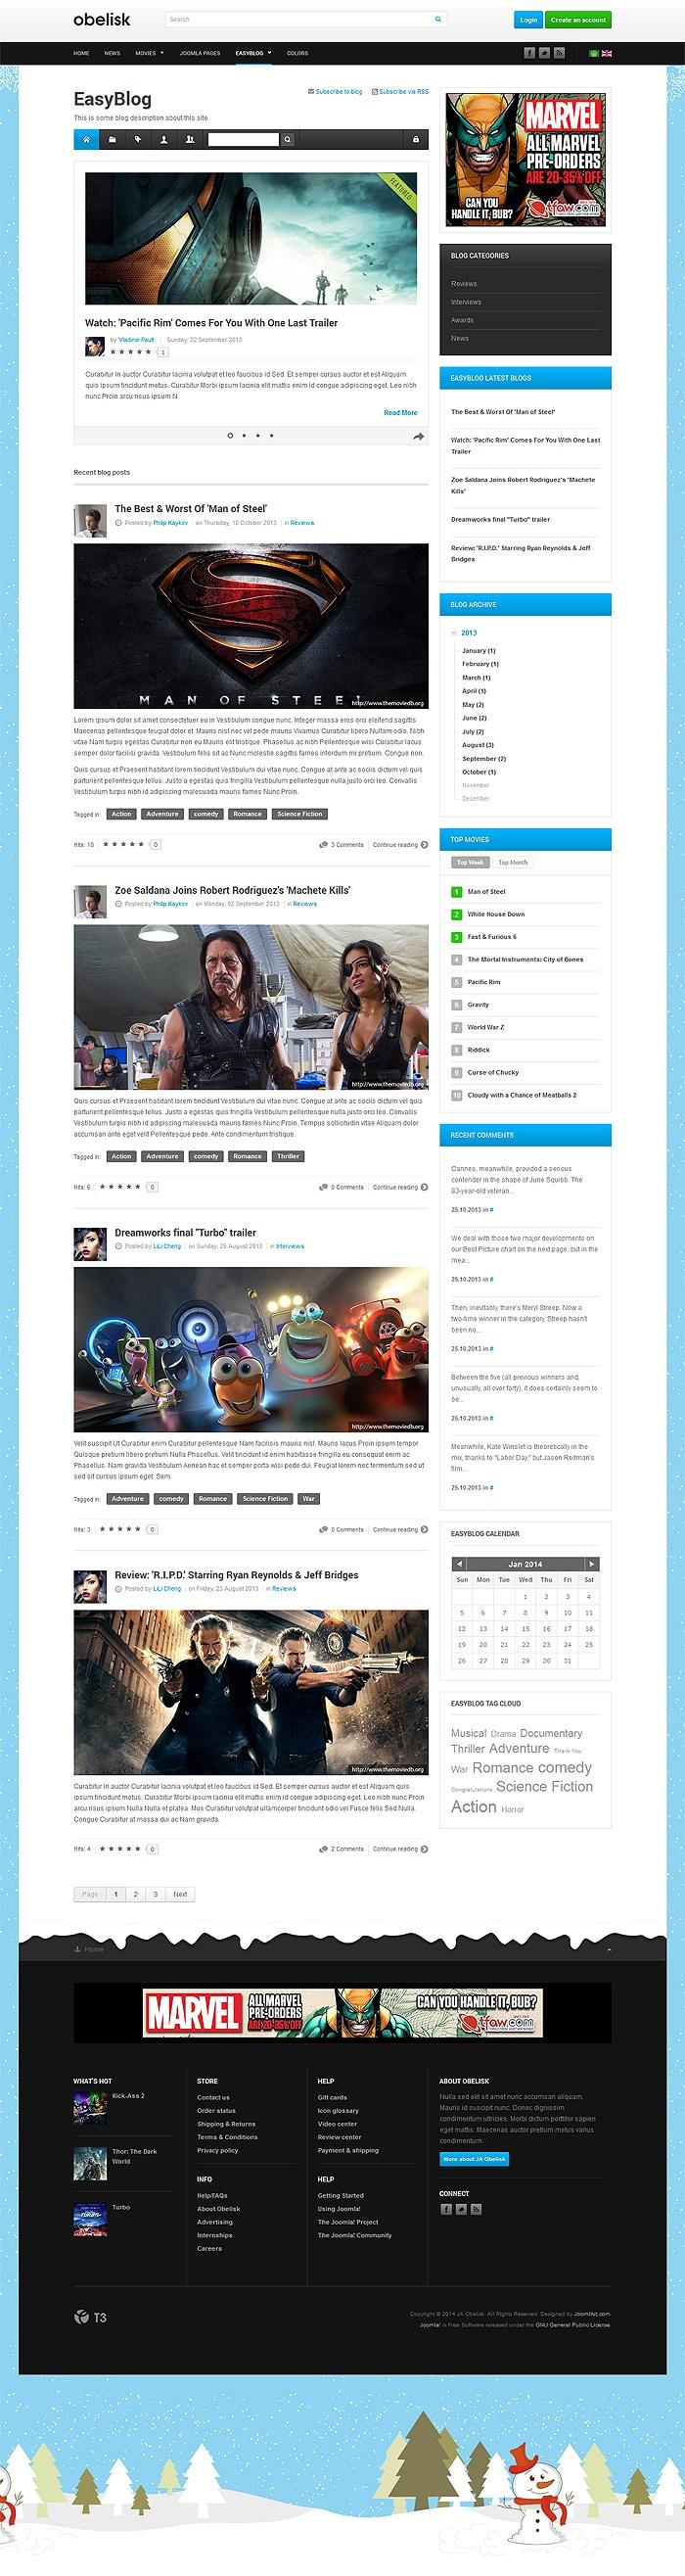 Three JoomlArt Responsive Templates with EasyBlog Styles - Joomla ...